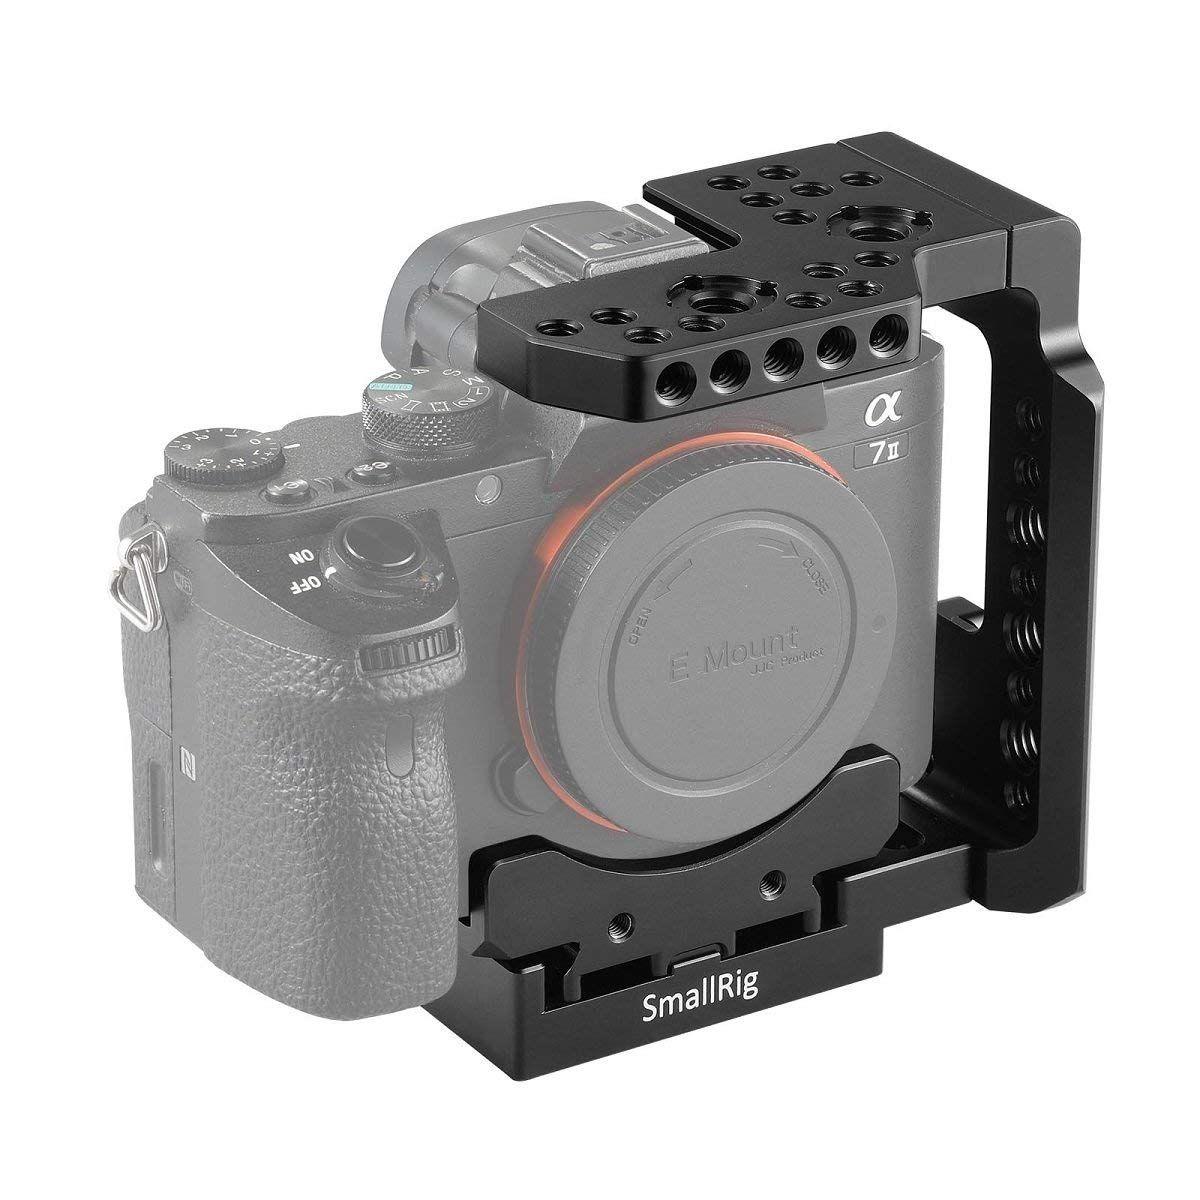 Smallrig A7 Kafig Fur Sony A7 Iii Amazon De Kamera Sony